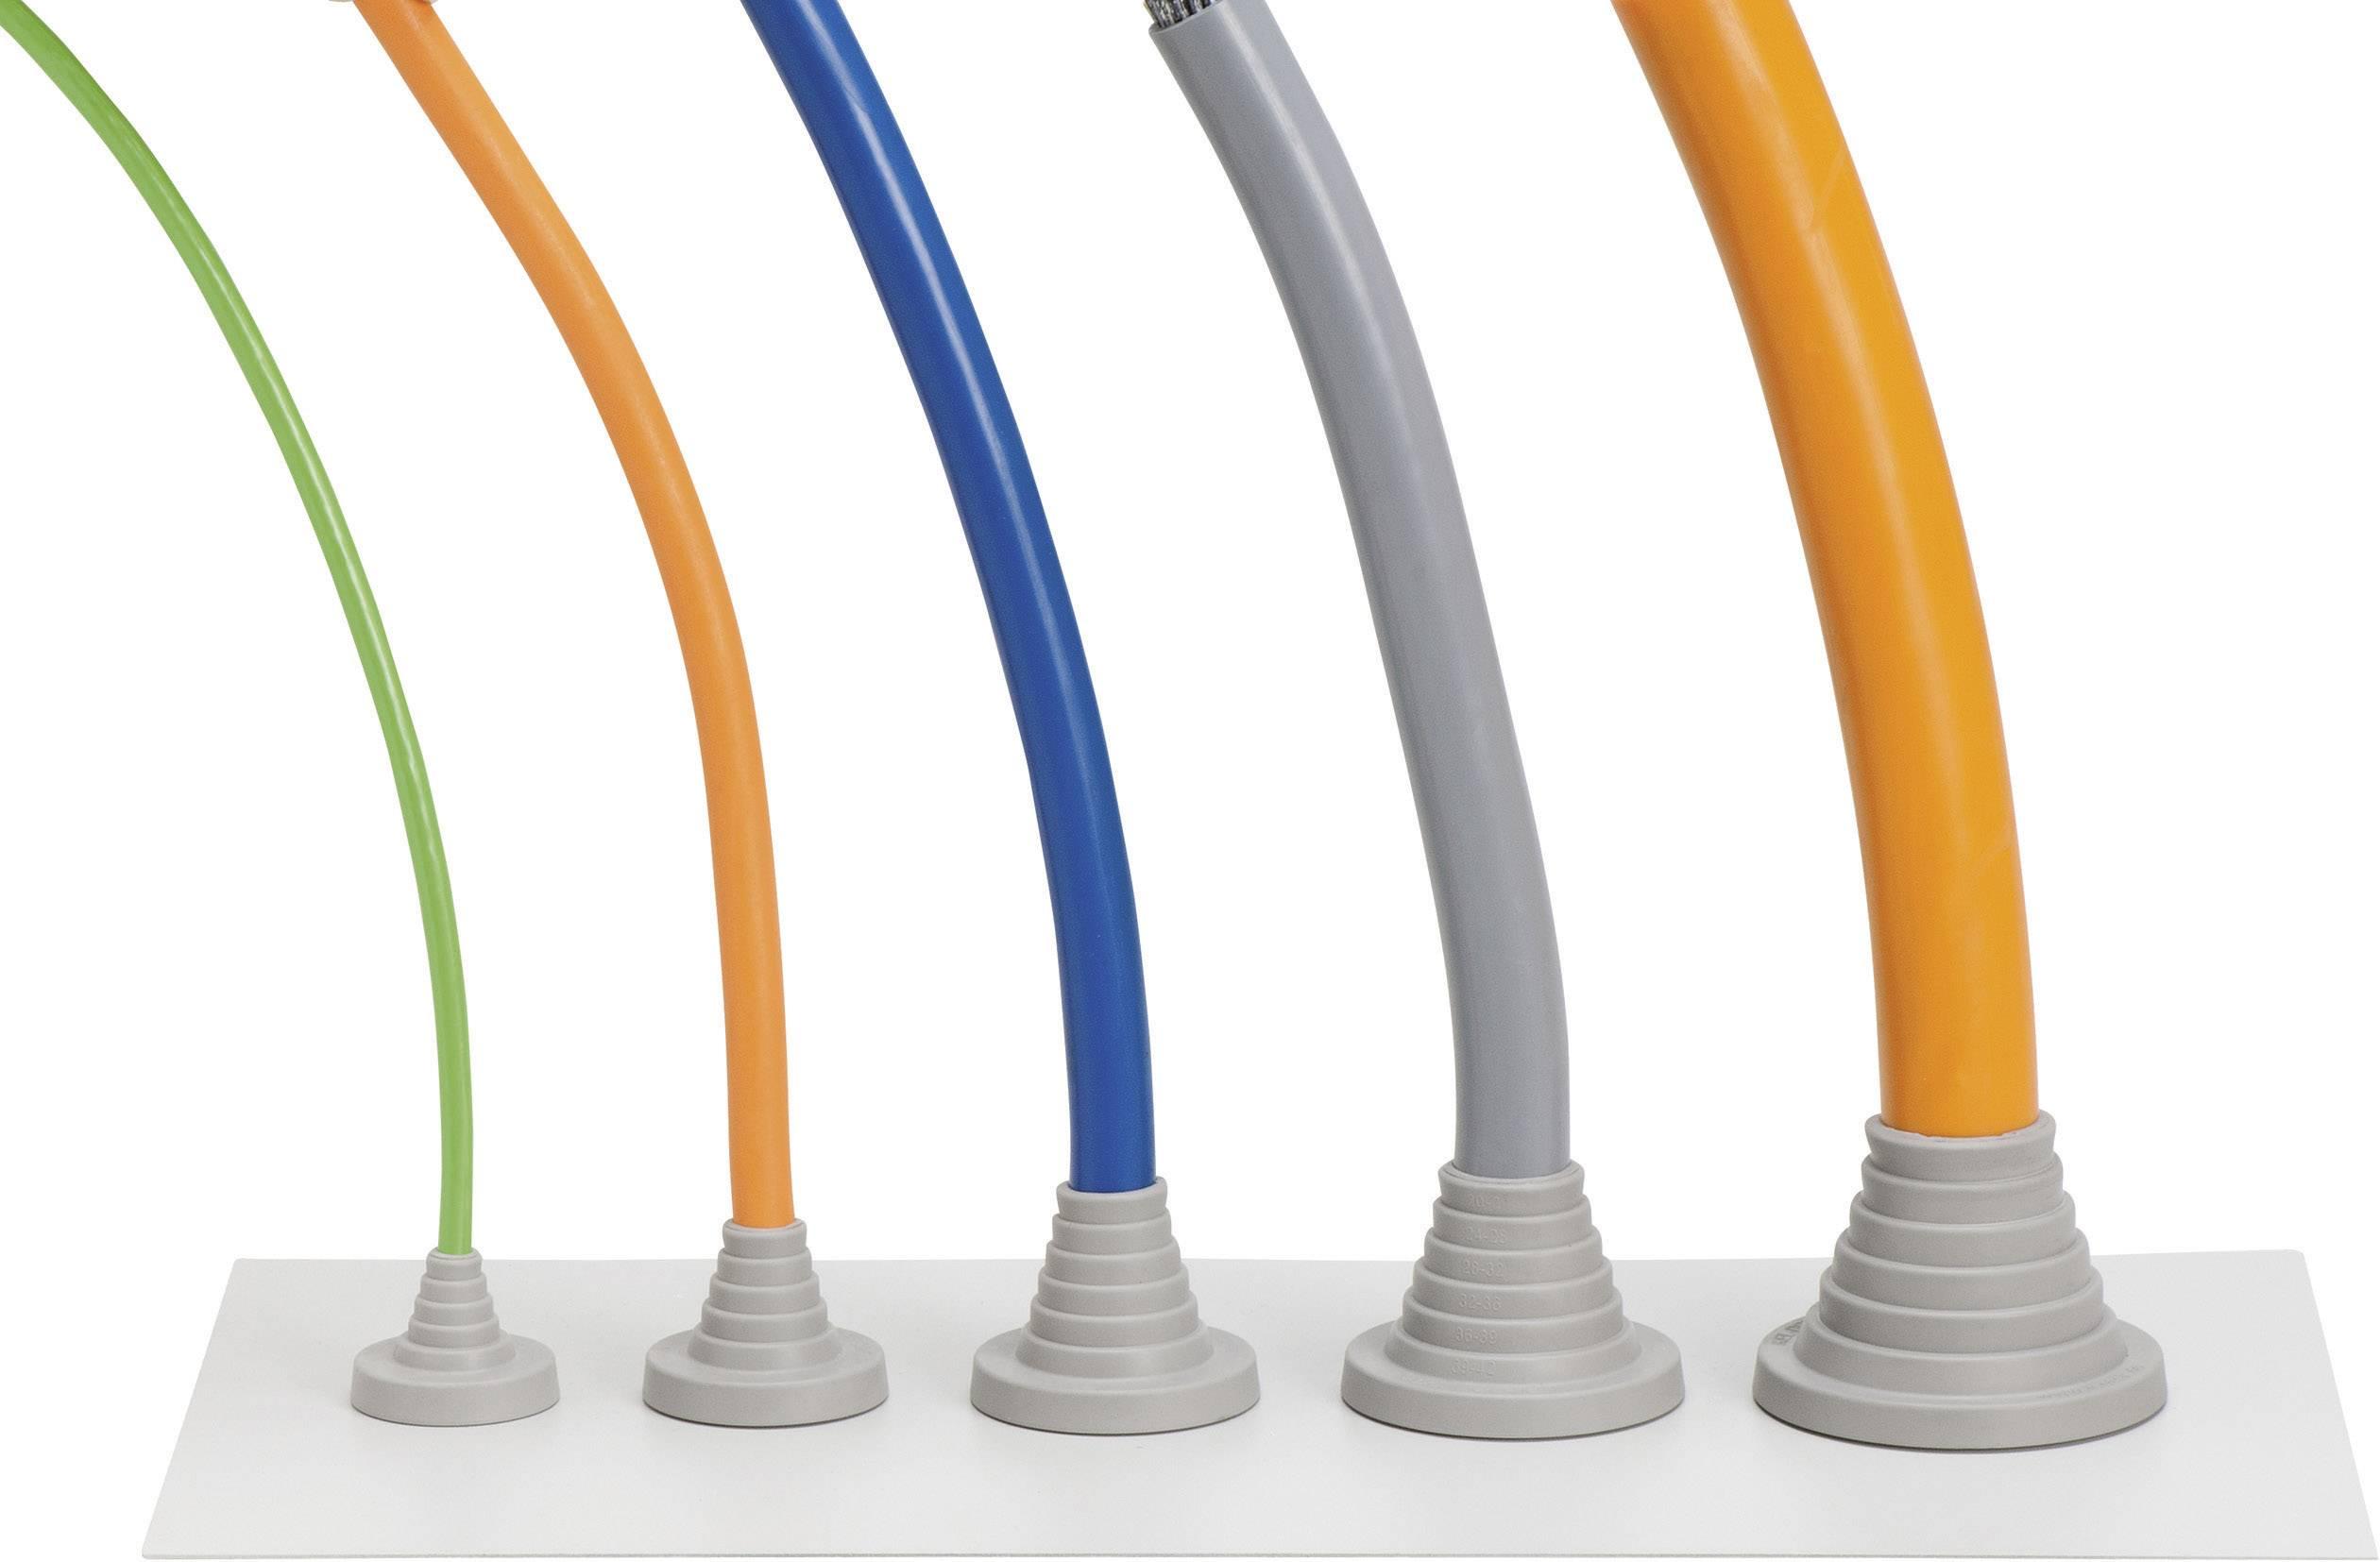 Icotek Uvodna kapa za kable KEL-DPF KEL-DPF 50/17-42 za kabel- 17 - 42 mm, velikost: M50 poliamid/elastomer, siva